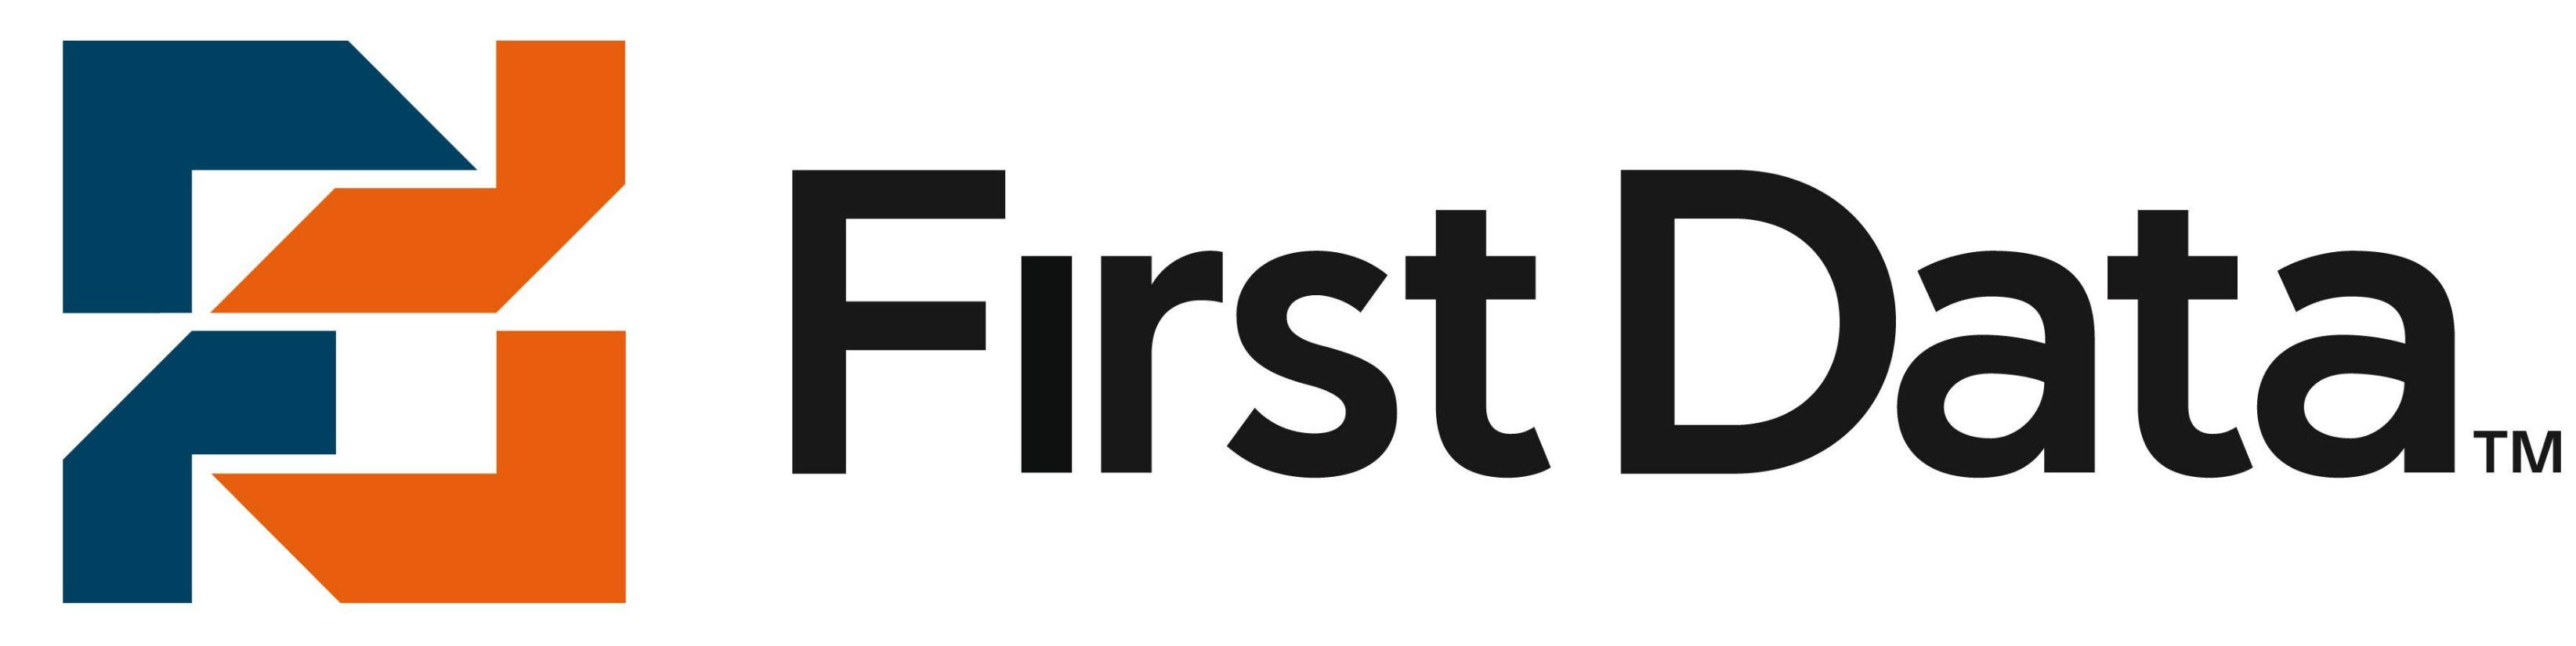 First Data Corporation logo